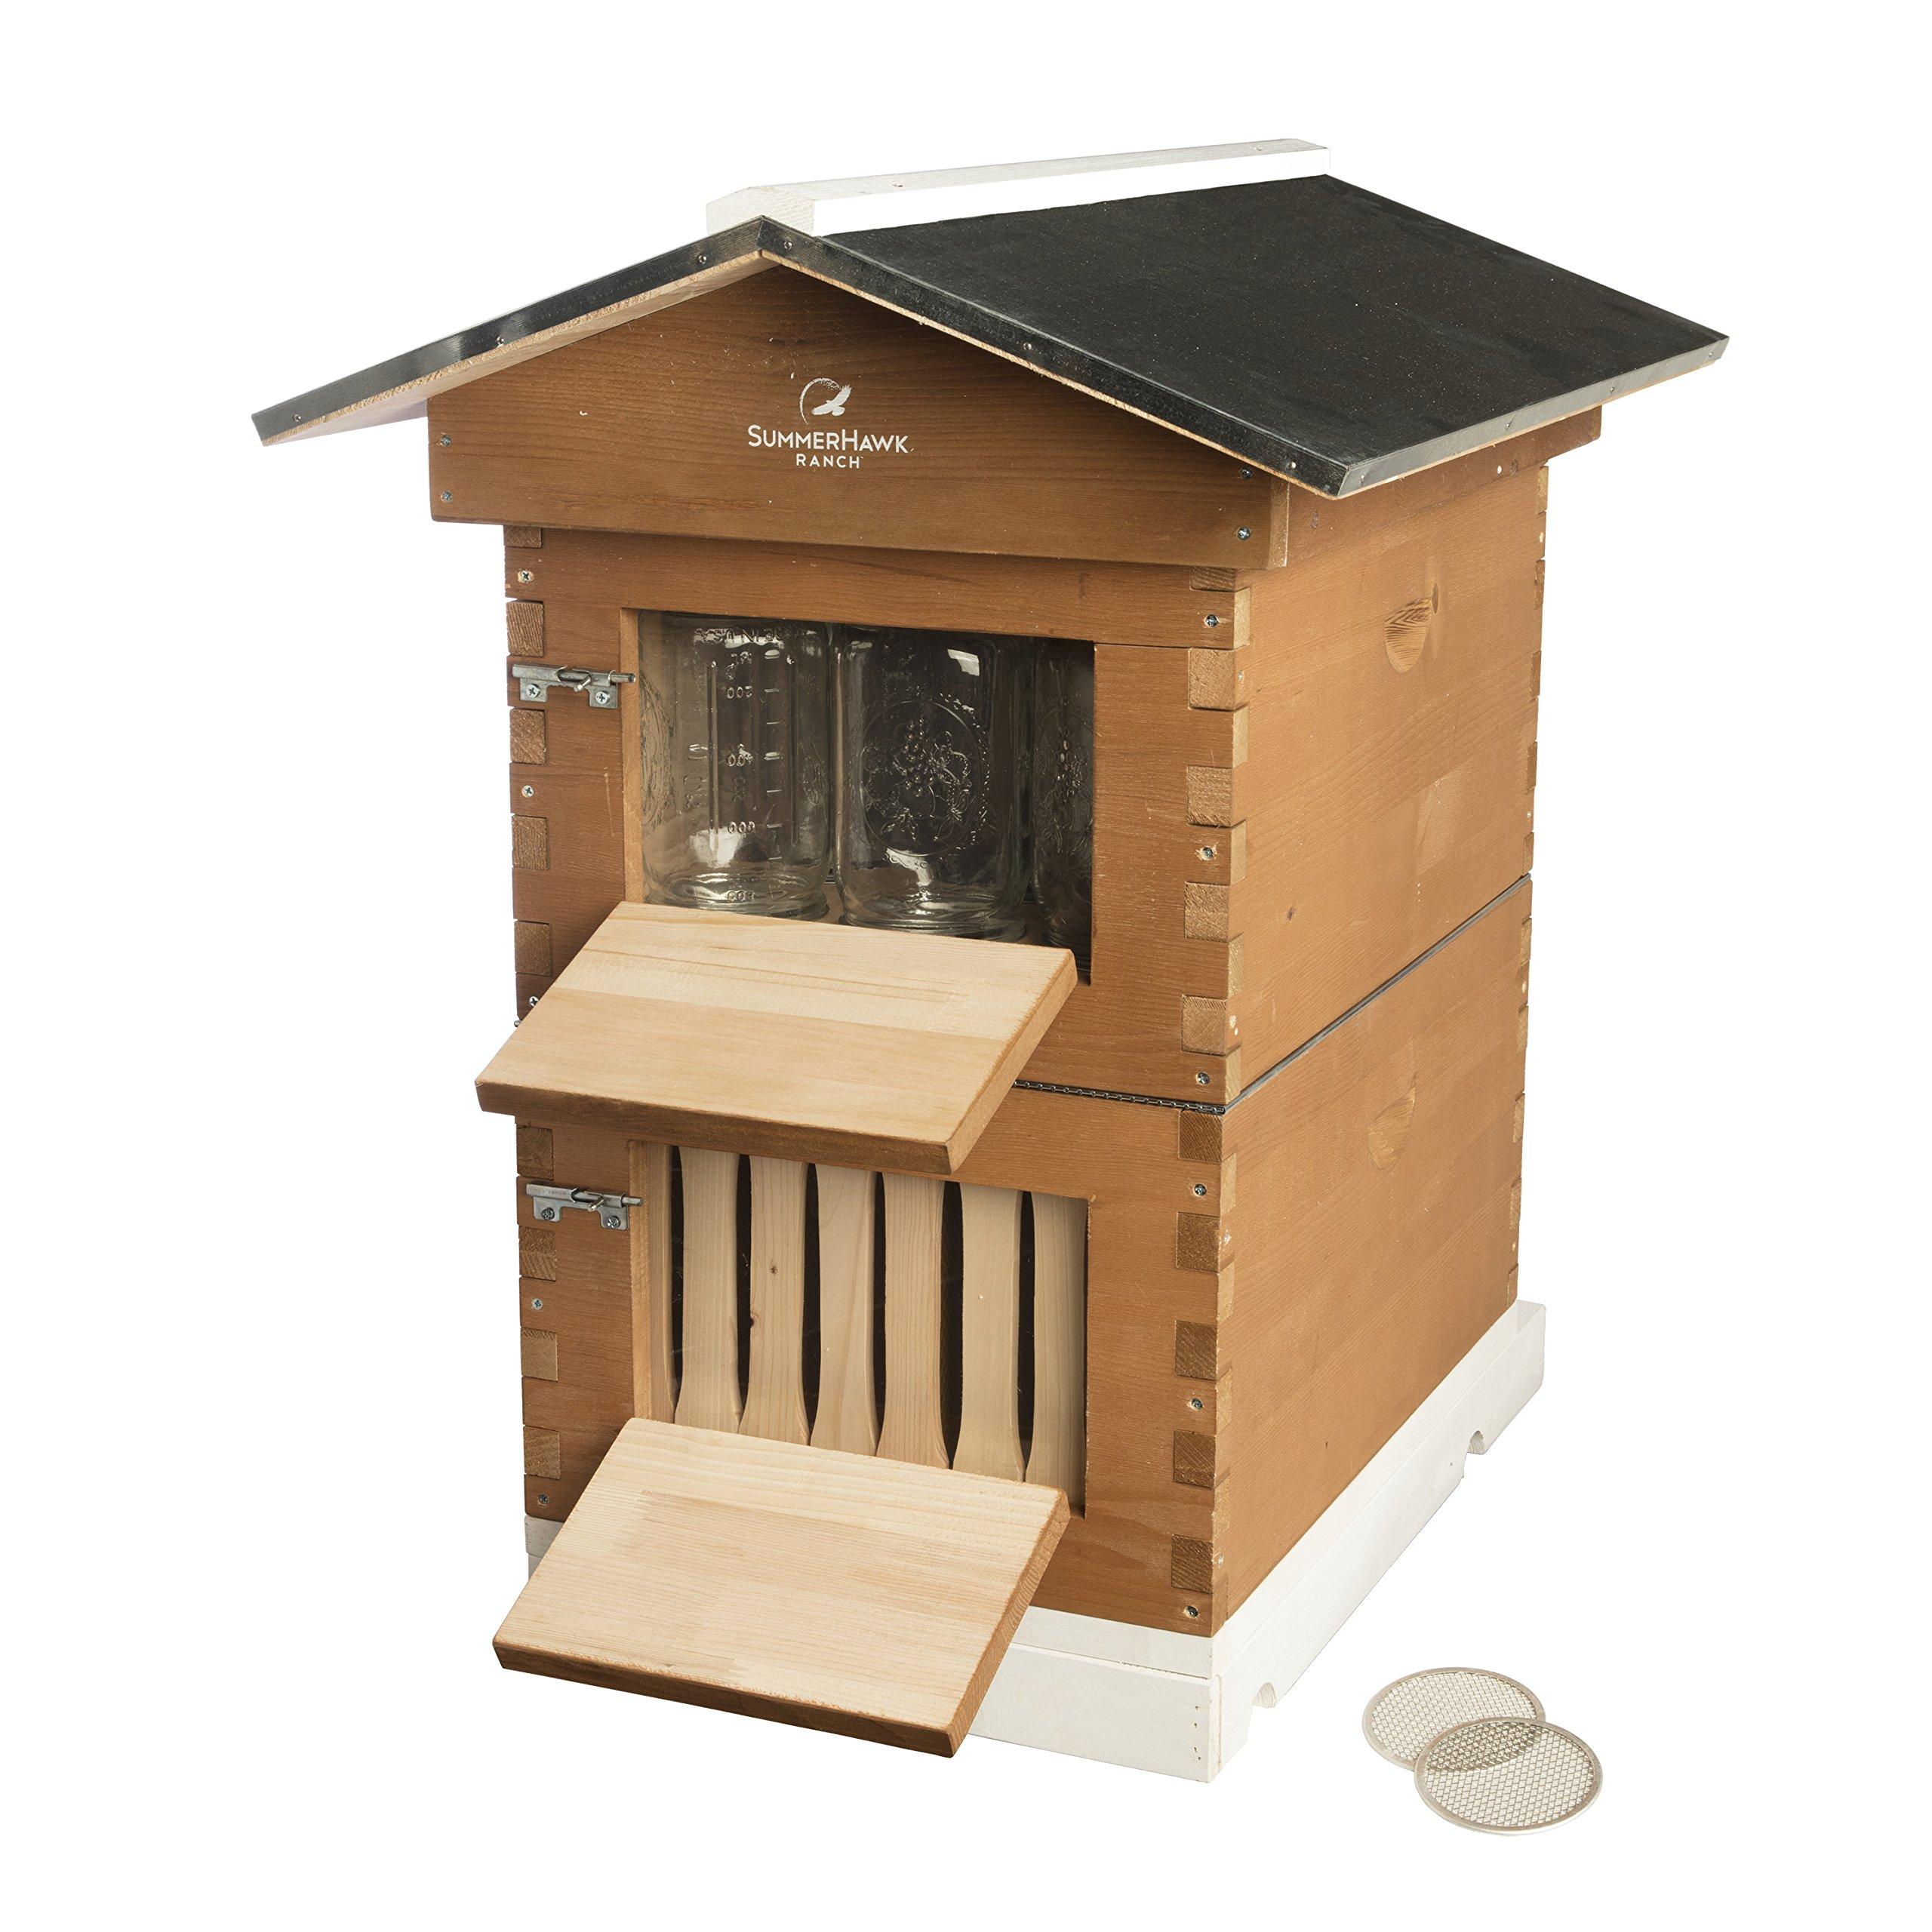 SummerHawk Ranch Honey Jar Hive - features Innovative Honey Harvesting System, Storing Honey directly in Mason Jars, Durable Backyard Bee Hive, Wooden Bee House for Beekeepers by SummerHawk Ranch